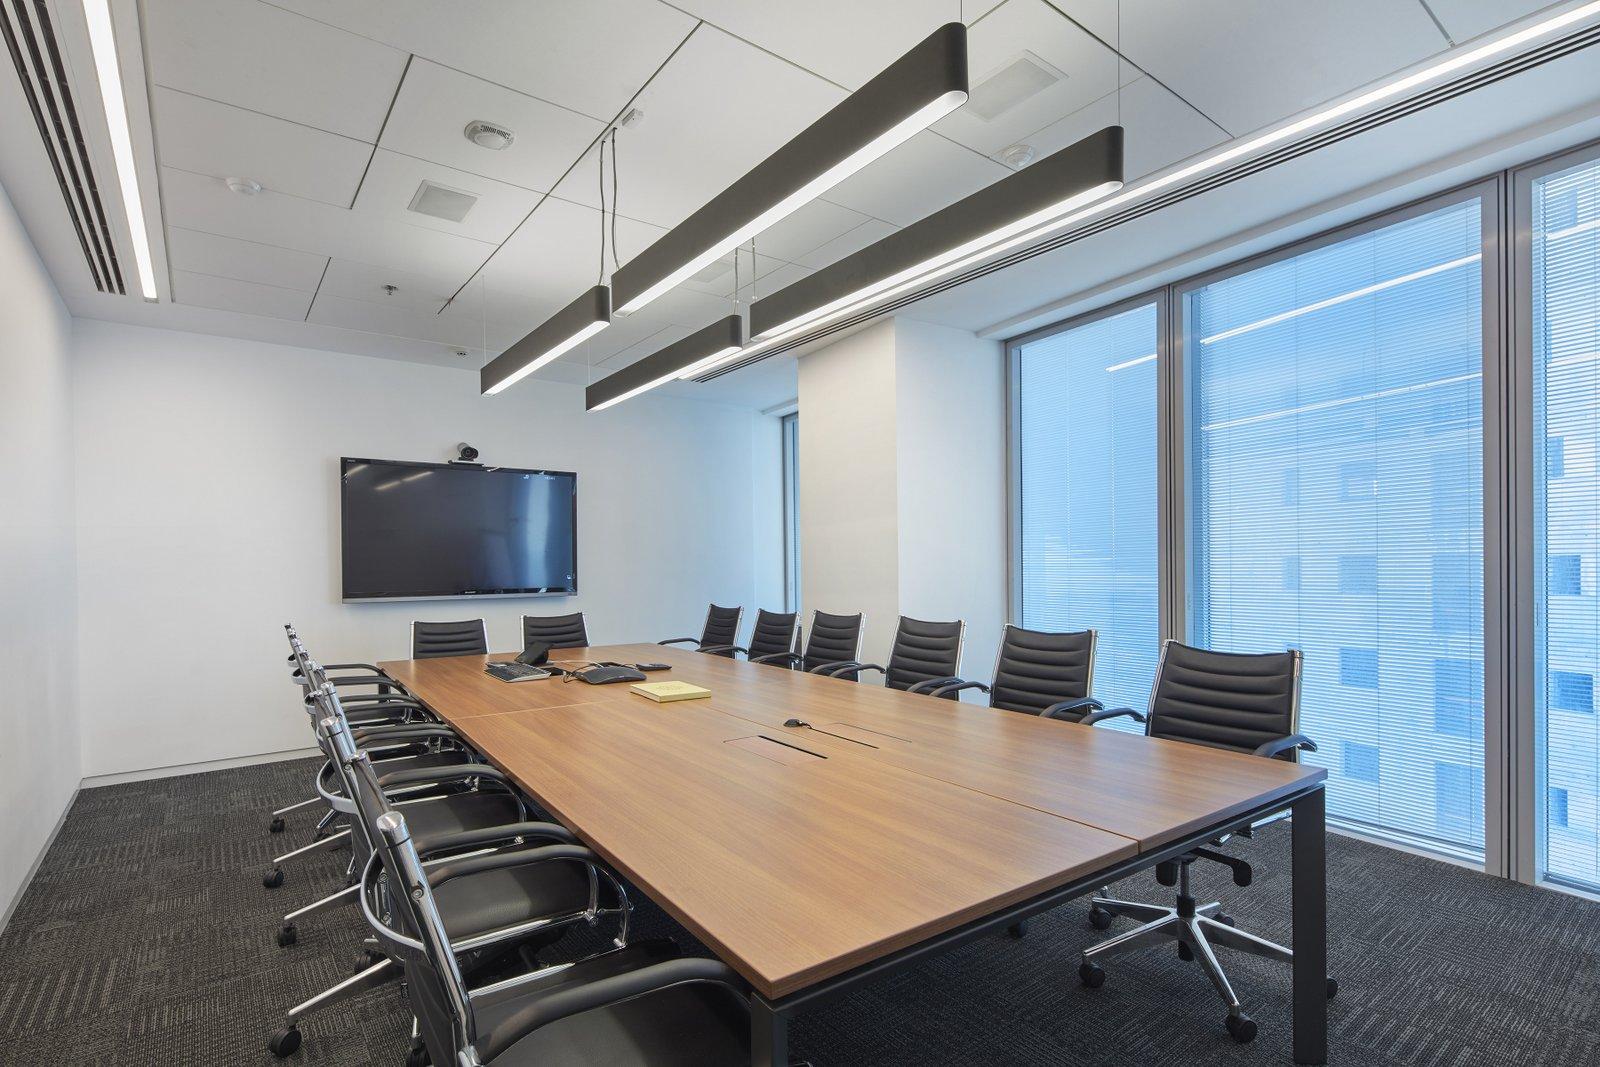 21 Modern Office Chair Designs Decorating Ideas  Design